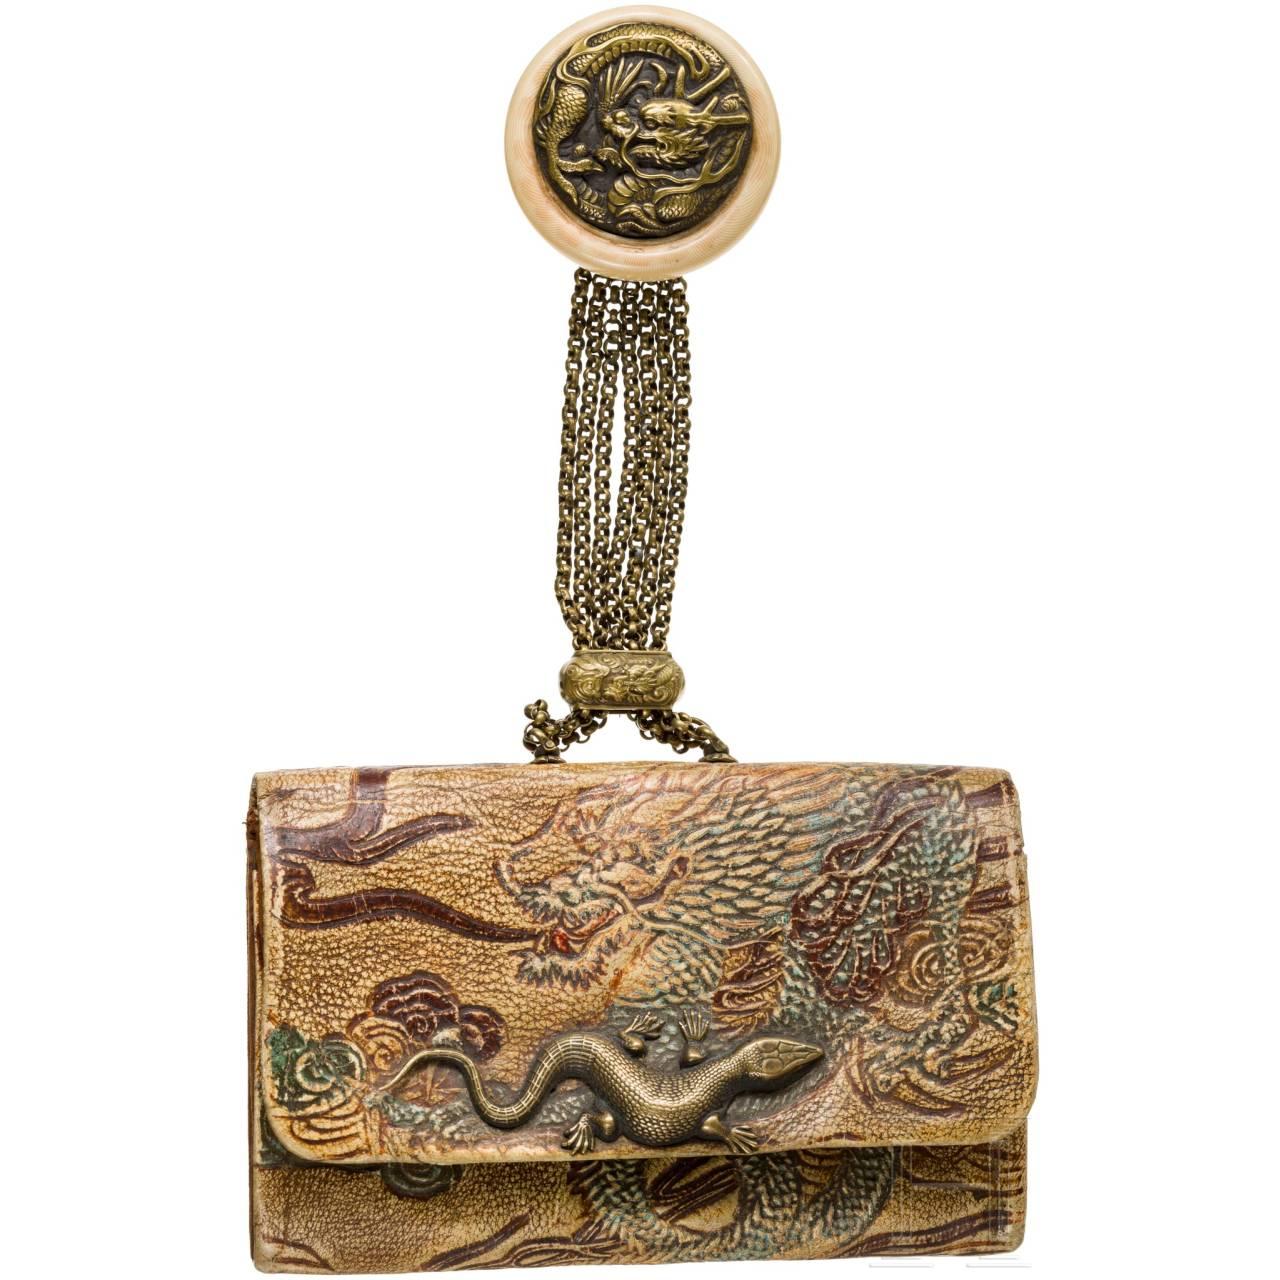 A Japanese tobacco box with Kagamibuta, Meiji-period, 19th century